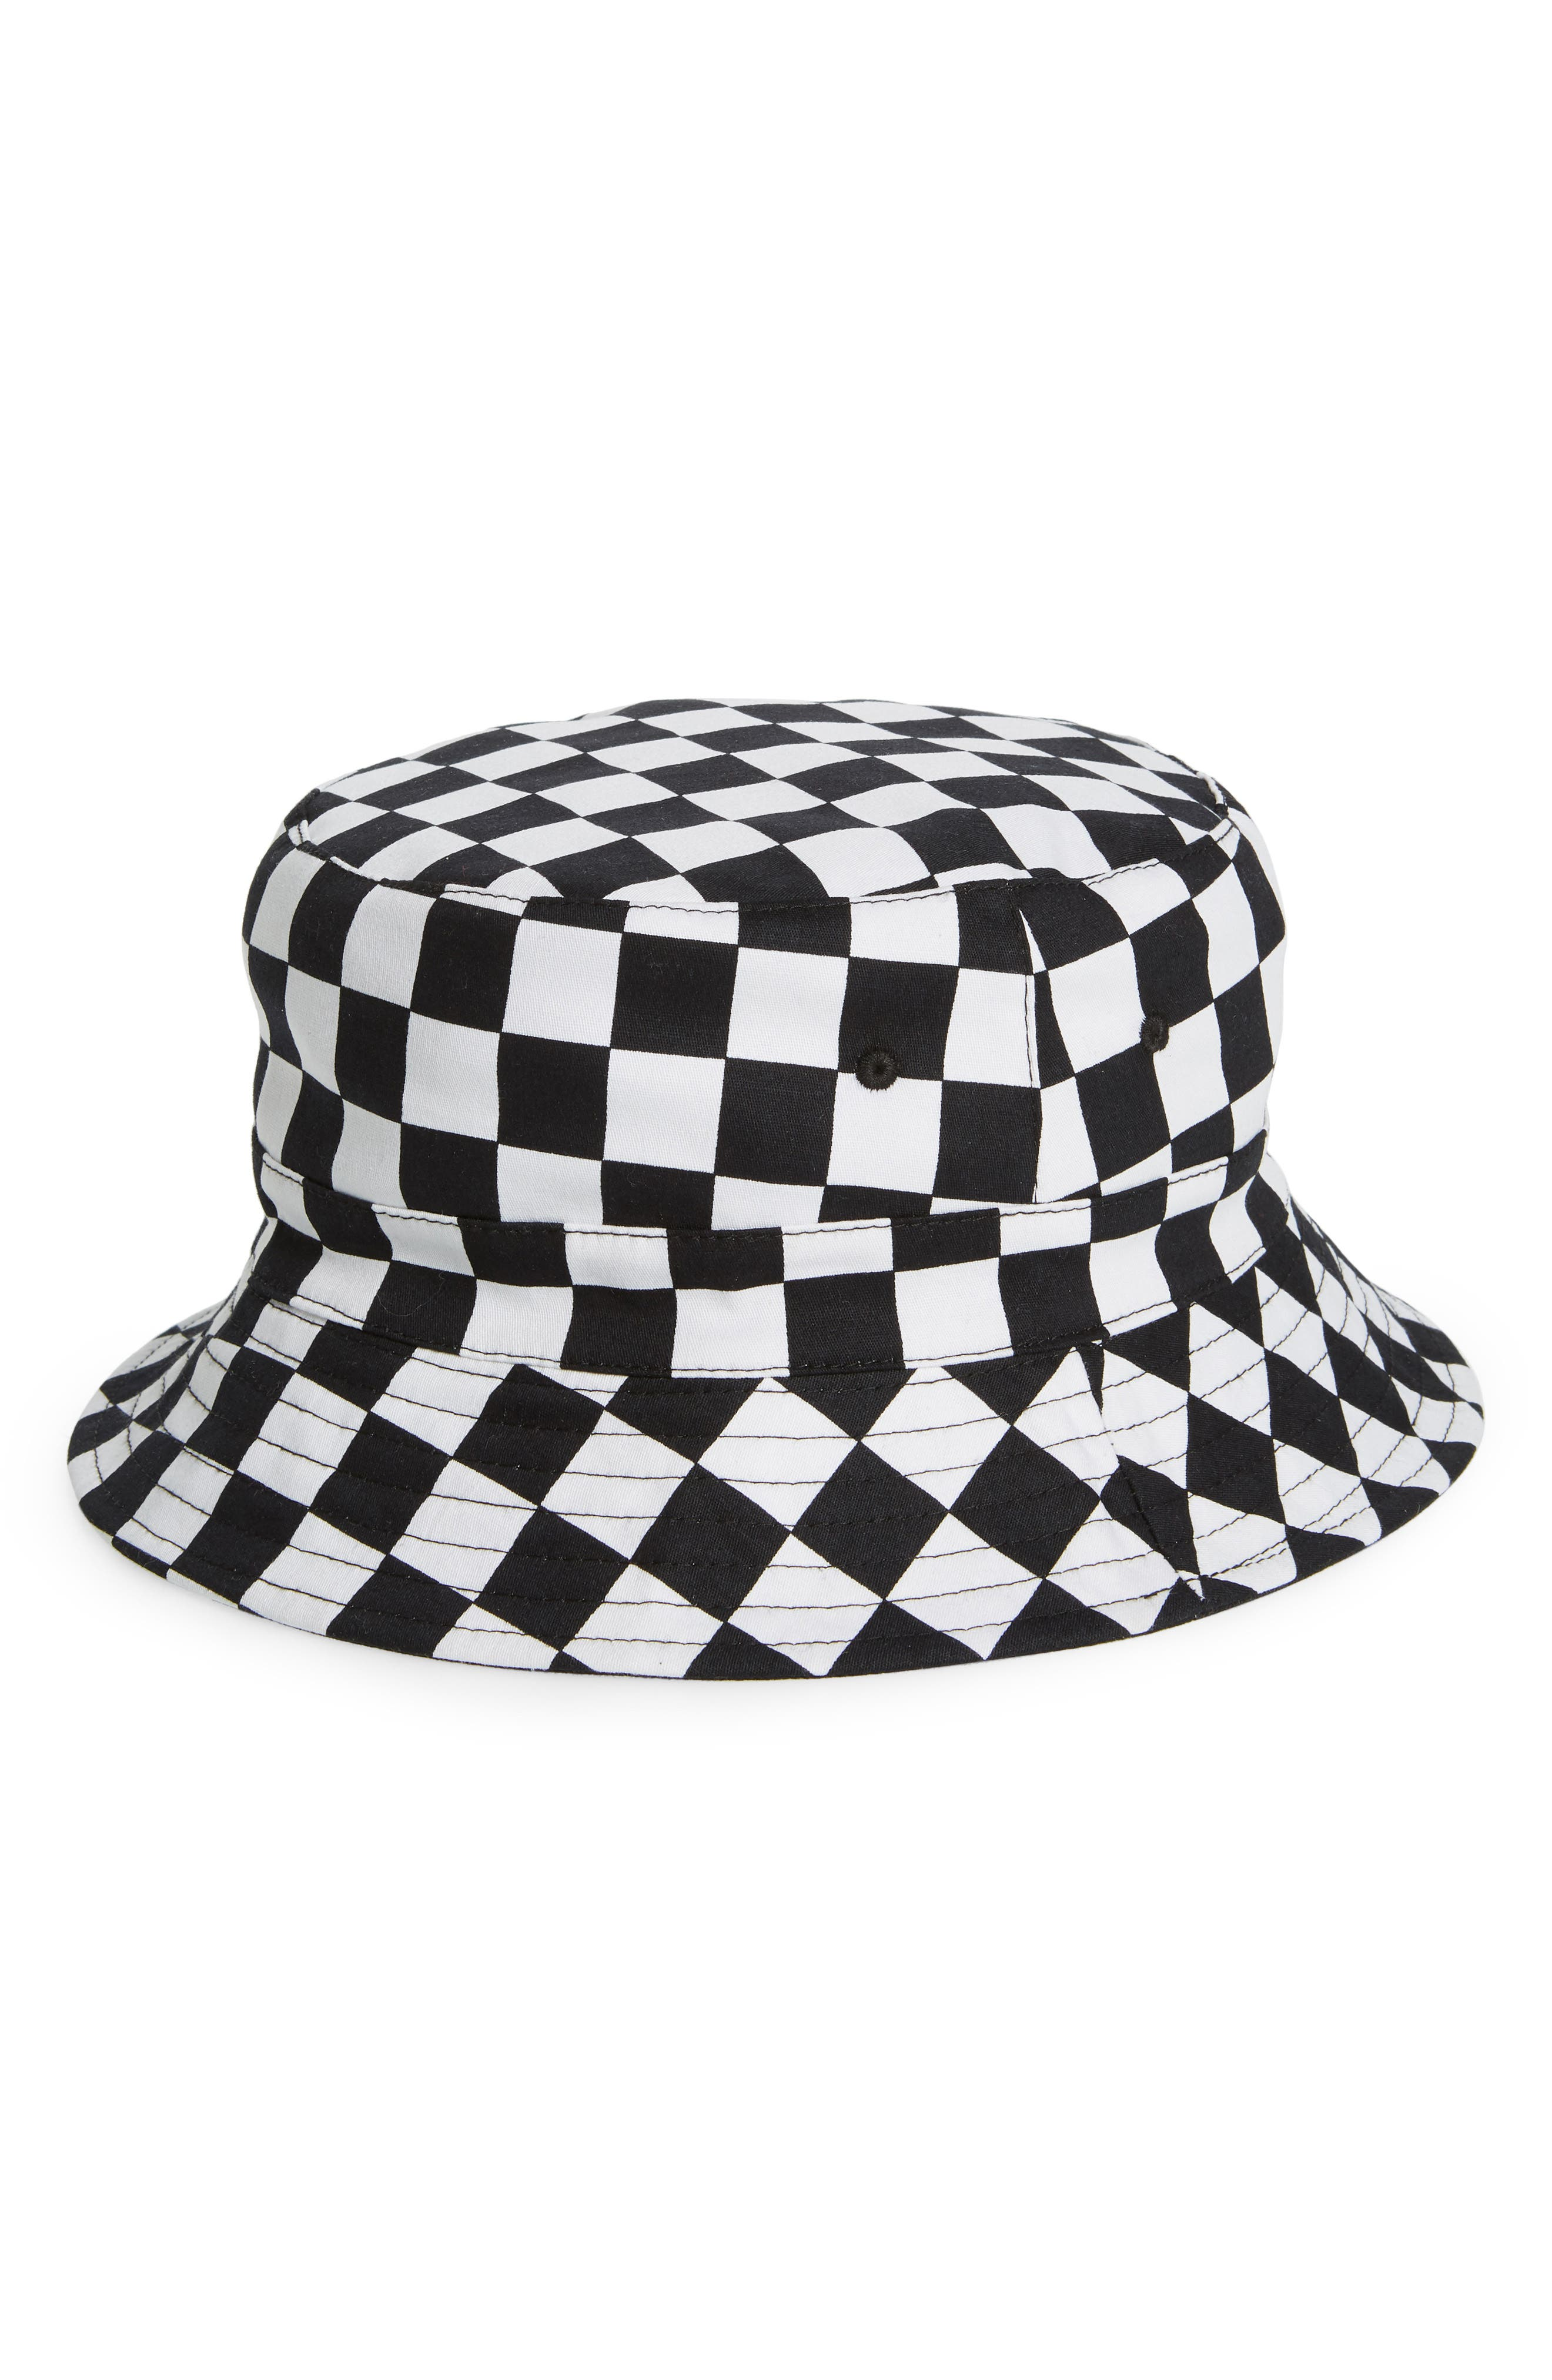 THE RAIL Rio Reversible Bucket Hat, Main, color, BLACK WHITE CHECK/ BLACK